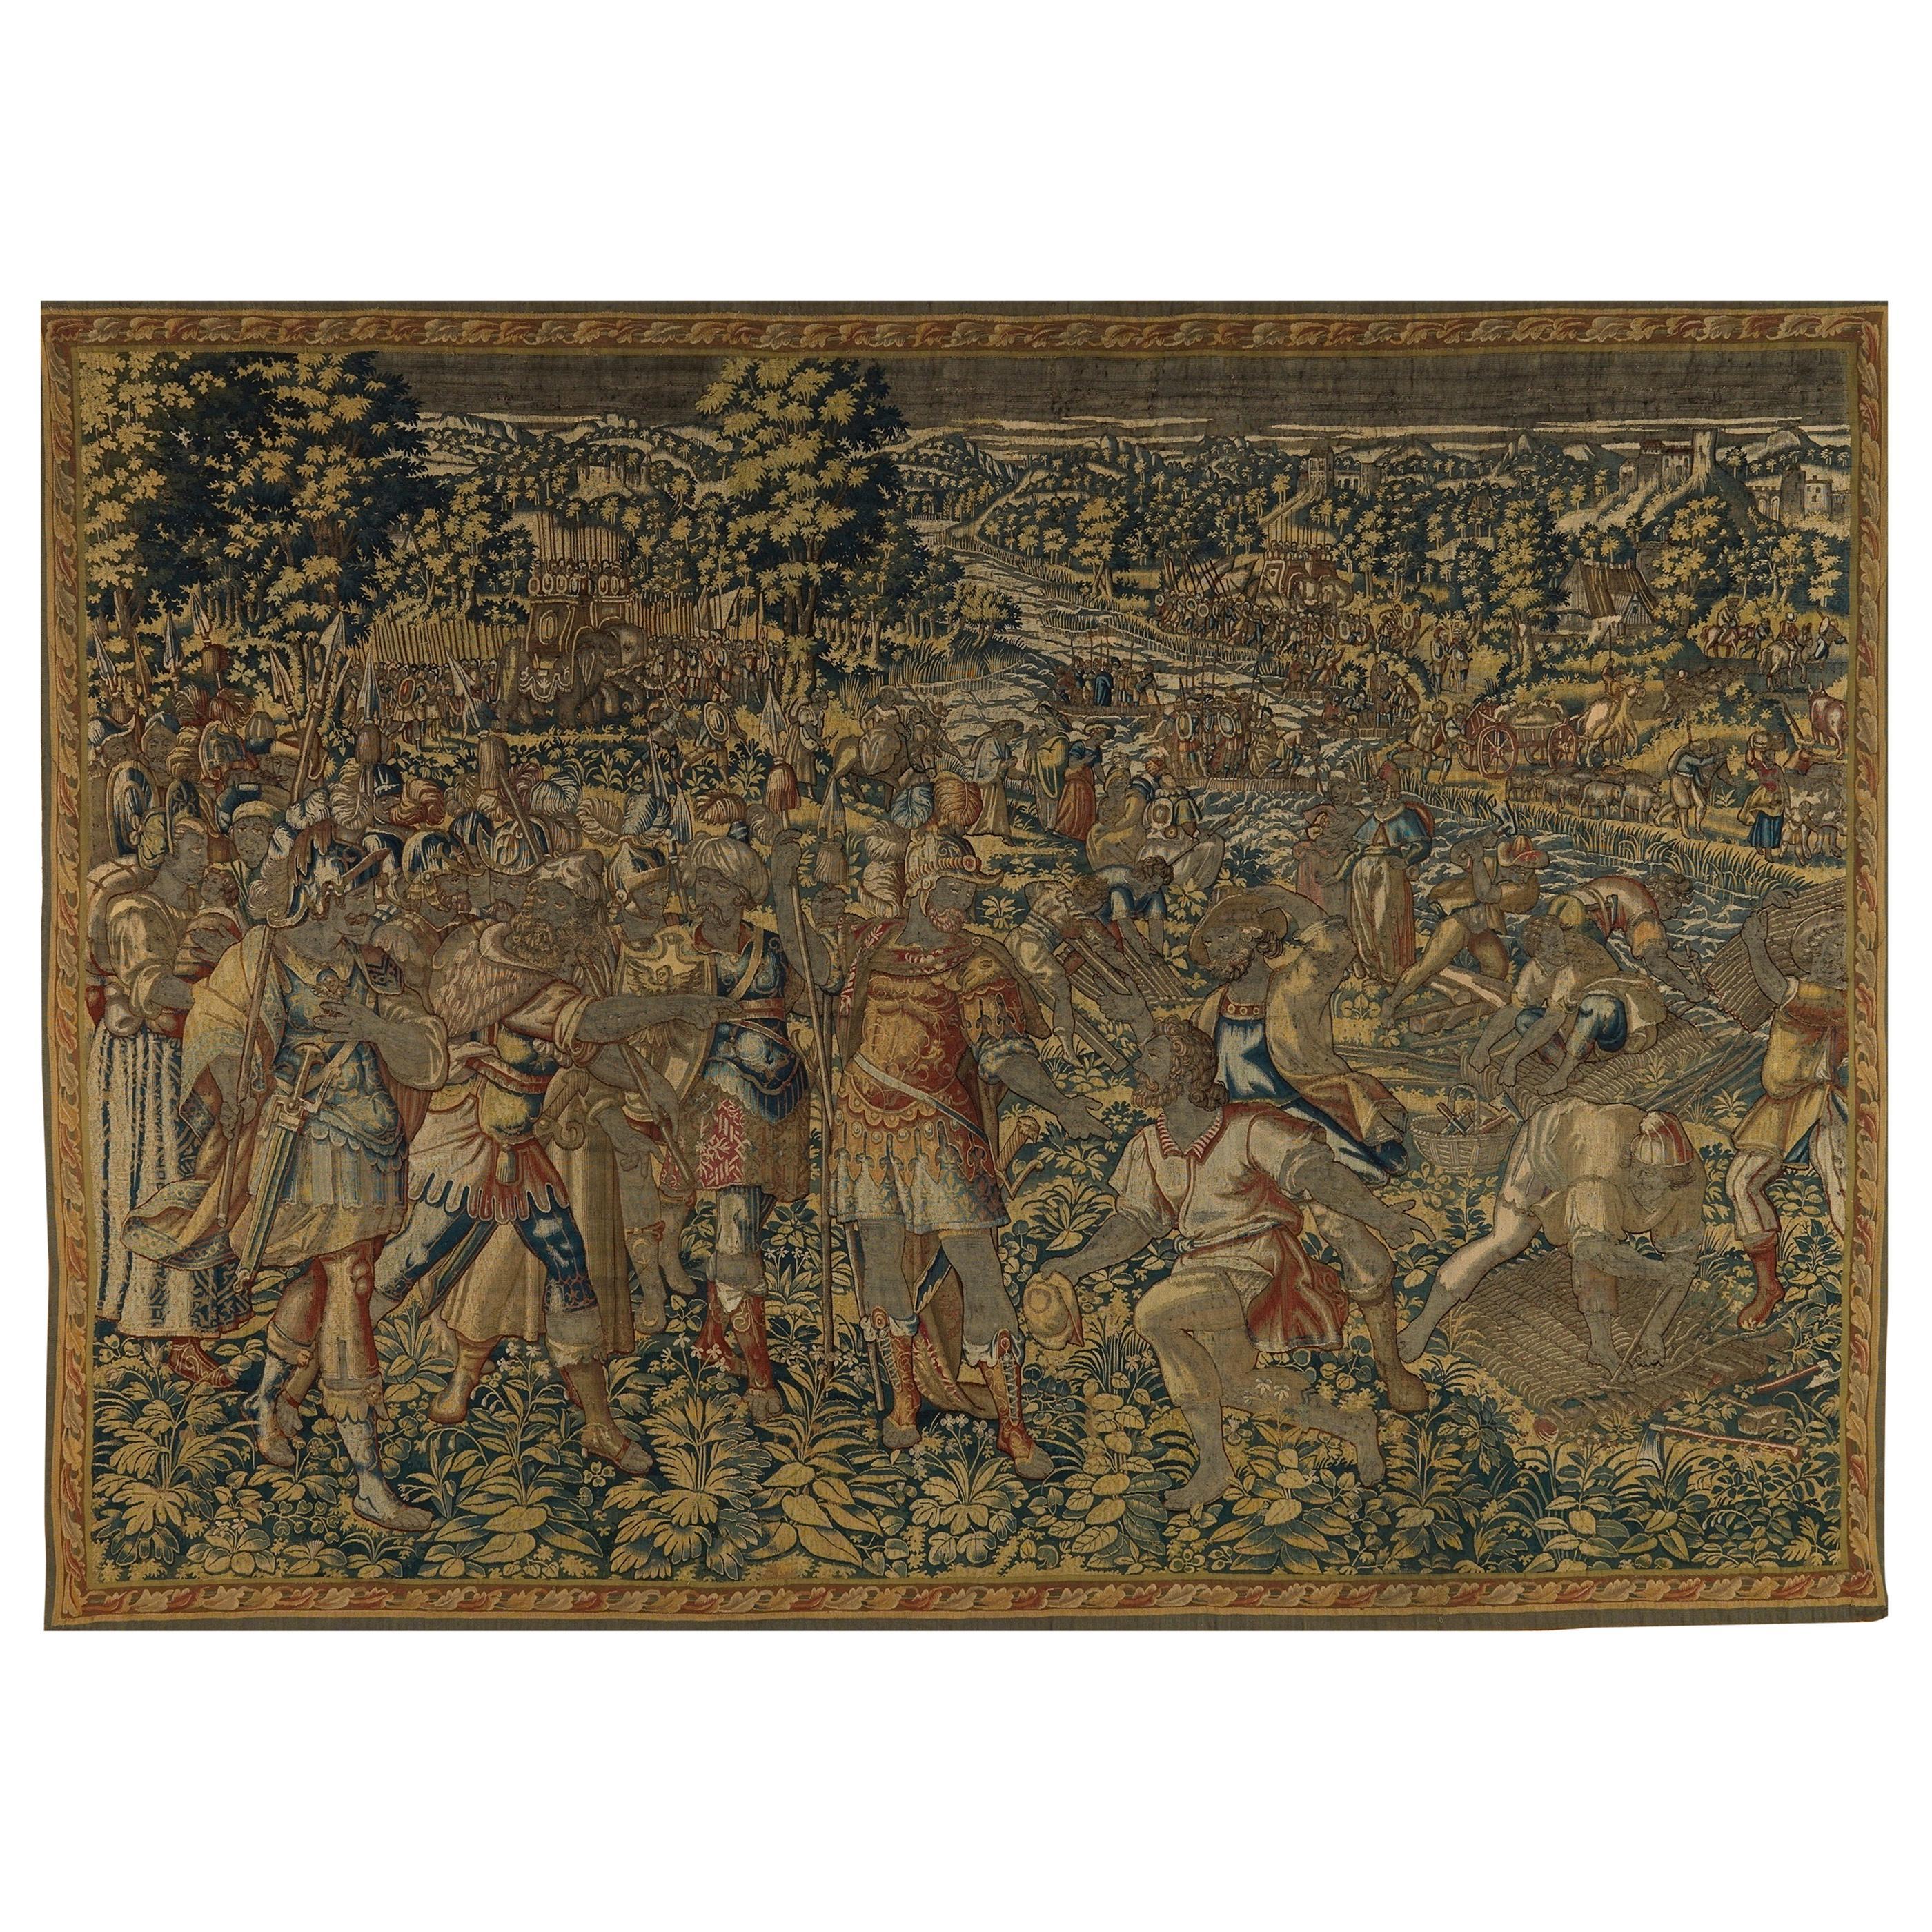 Antique Mid-16th Century Historical Flemish Renaissance Tapestry